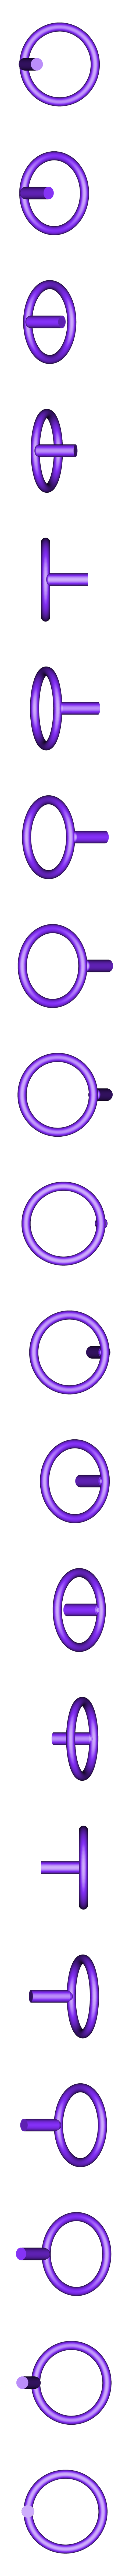 Ring.stl Download free STL file AngelBenchyTreeTopper • 3D printing model, Digitang3D